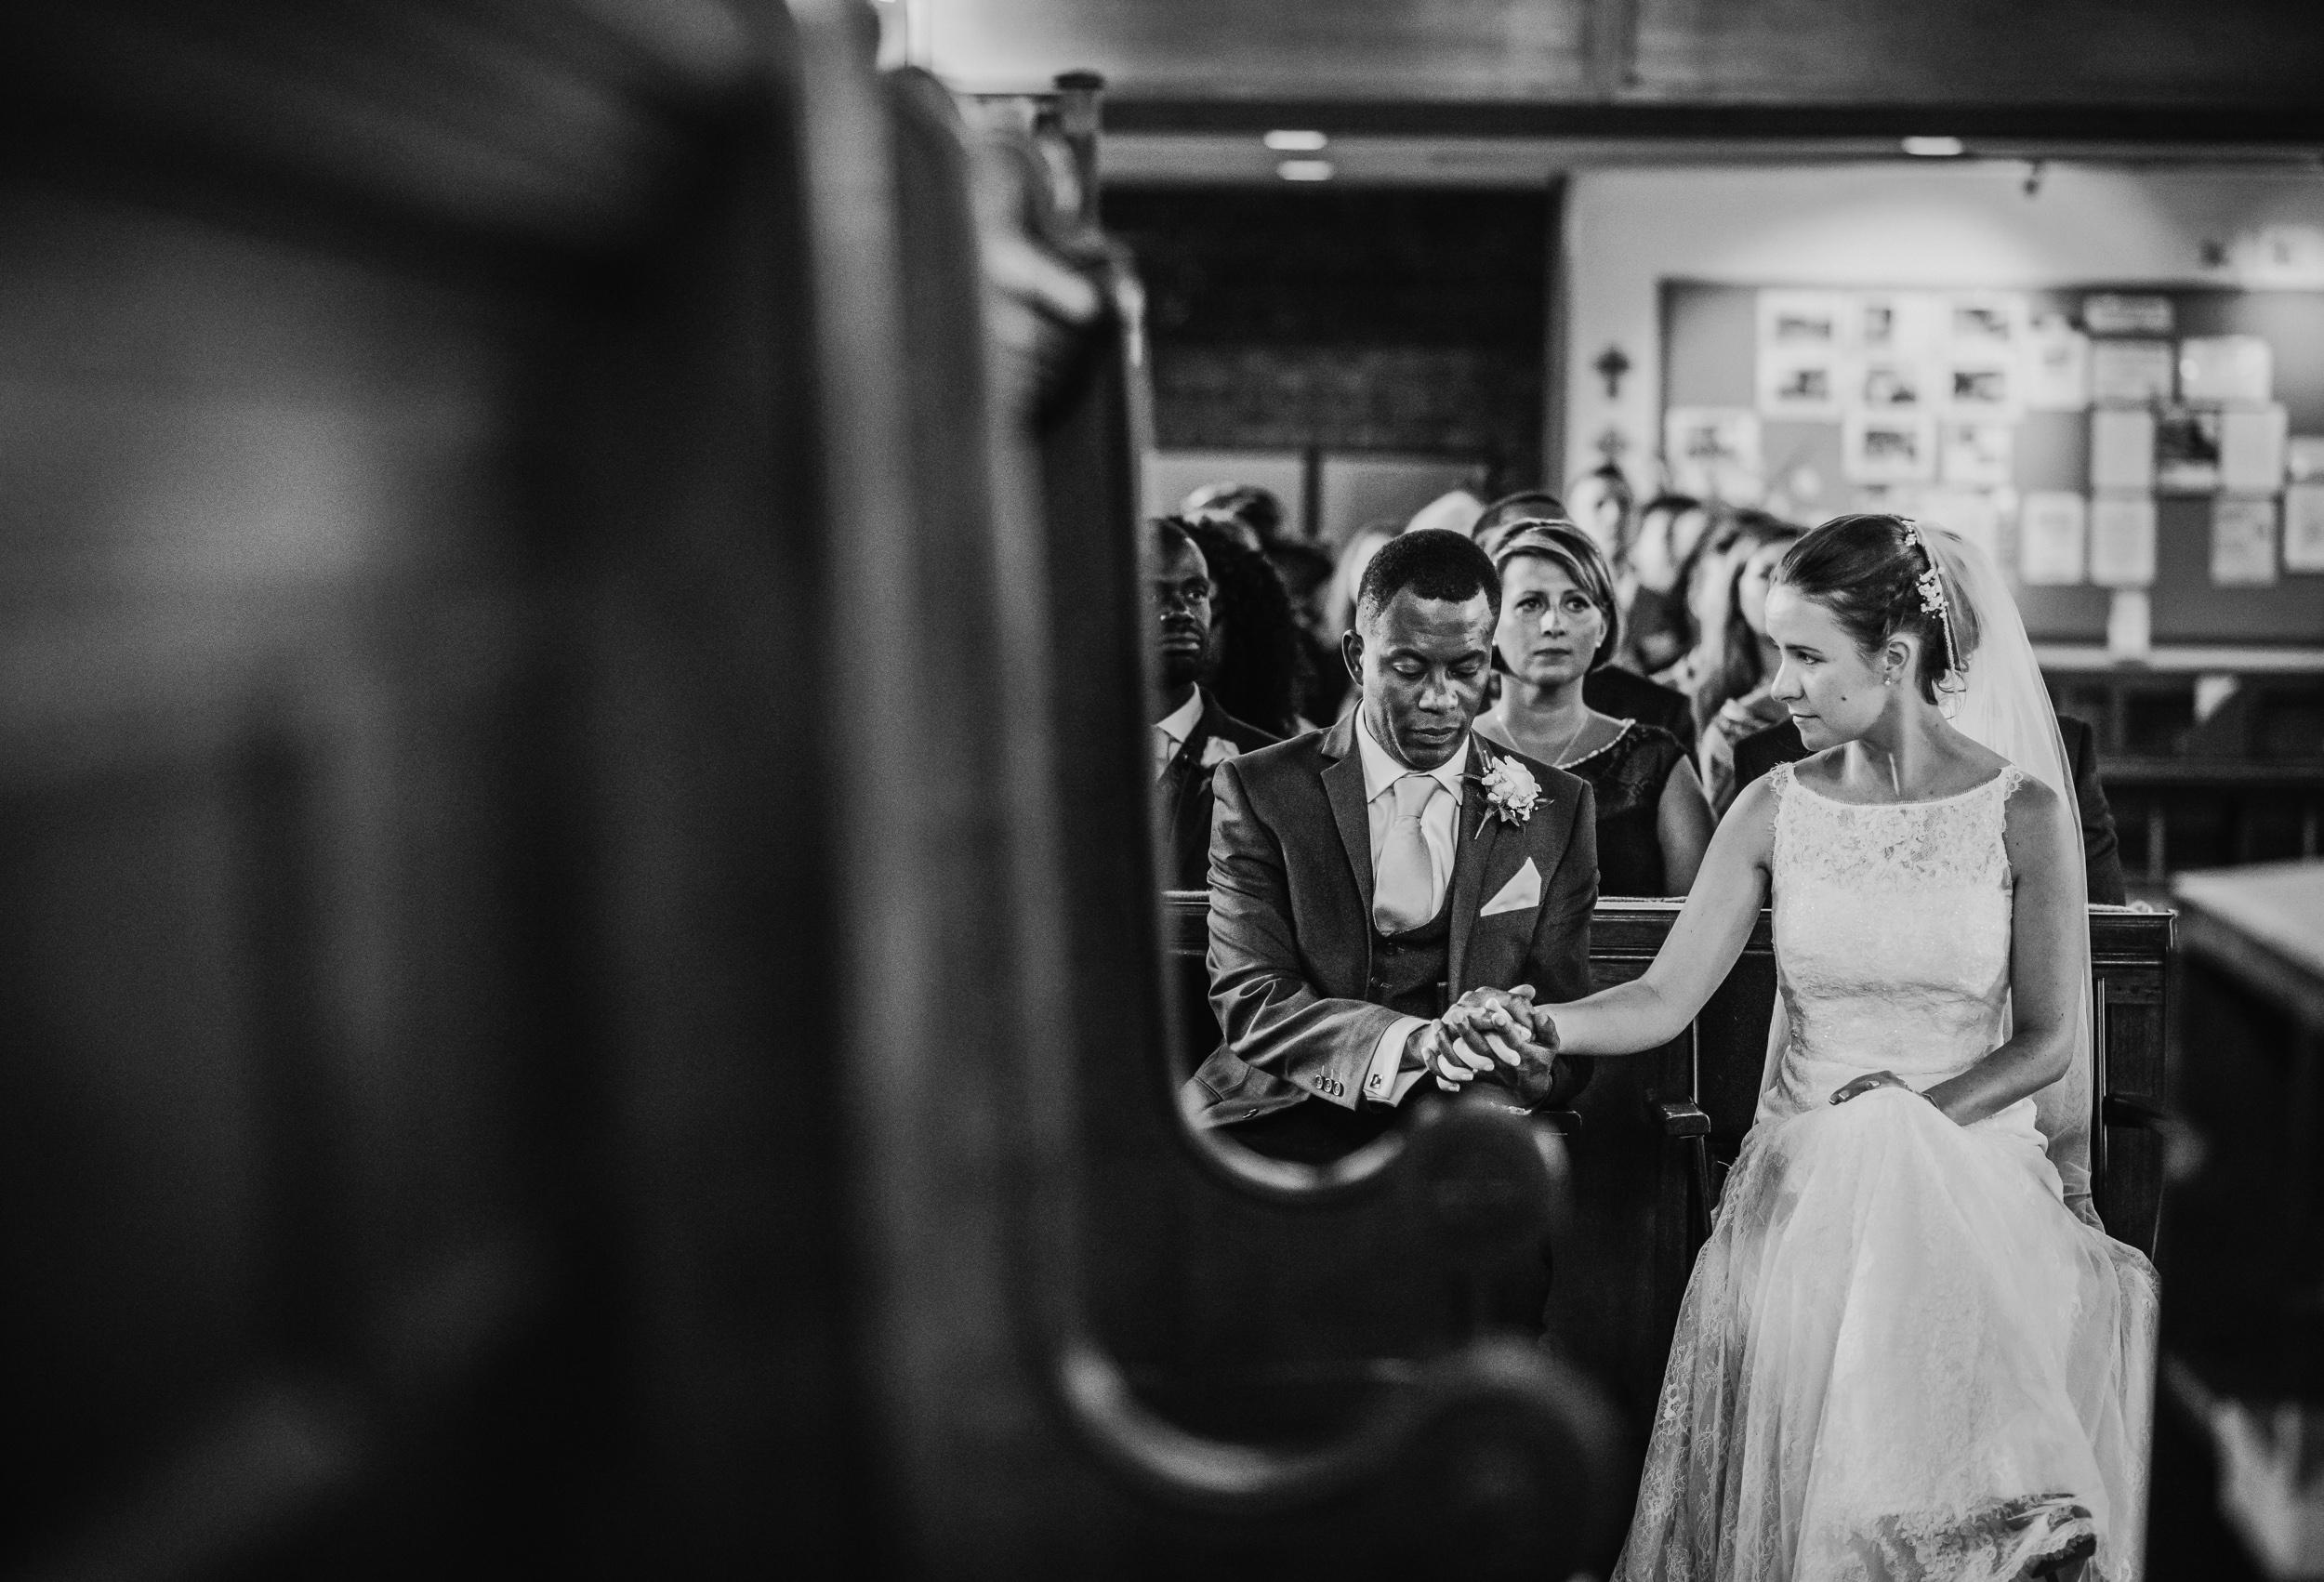 David Scholes Lancashire wedding photography 2016-155.jpg